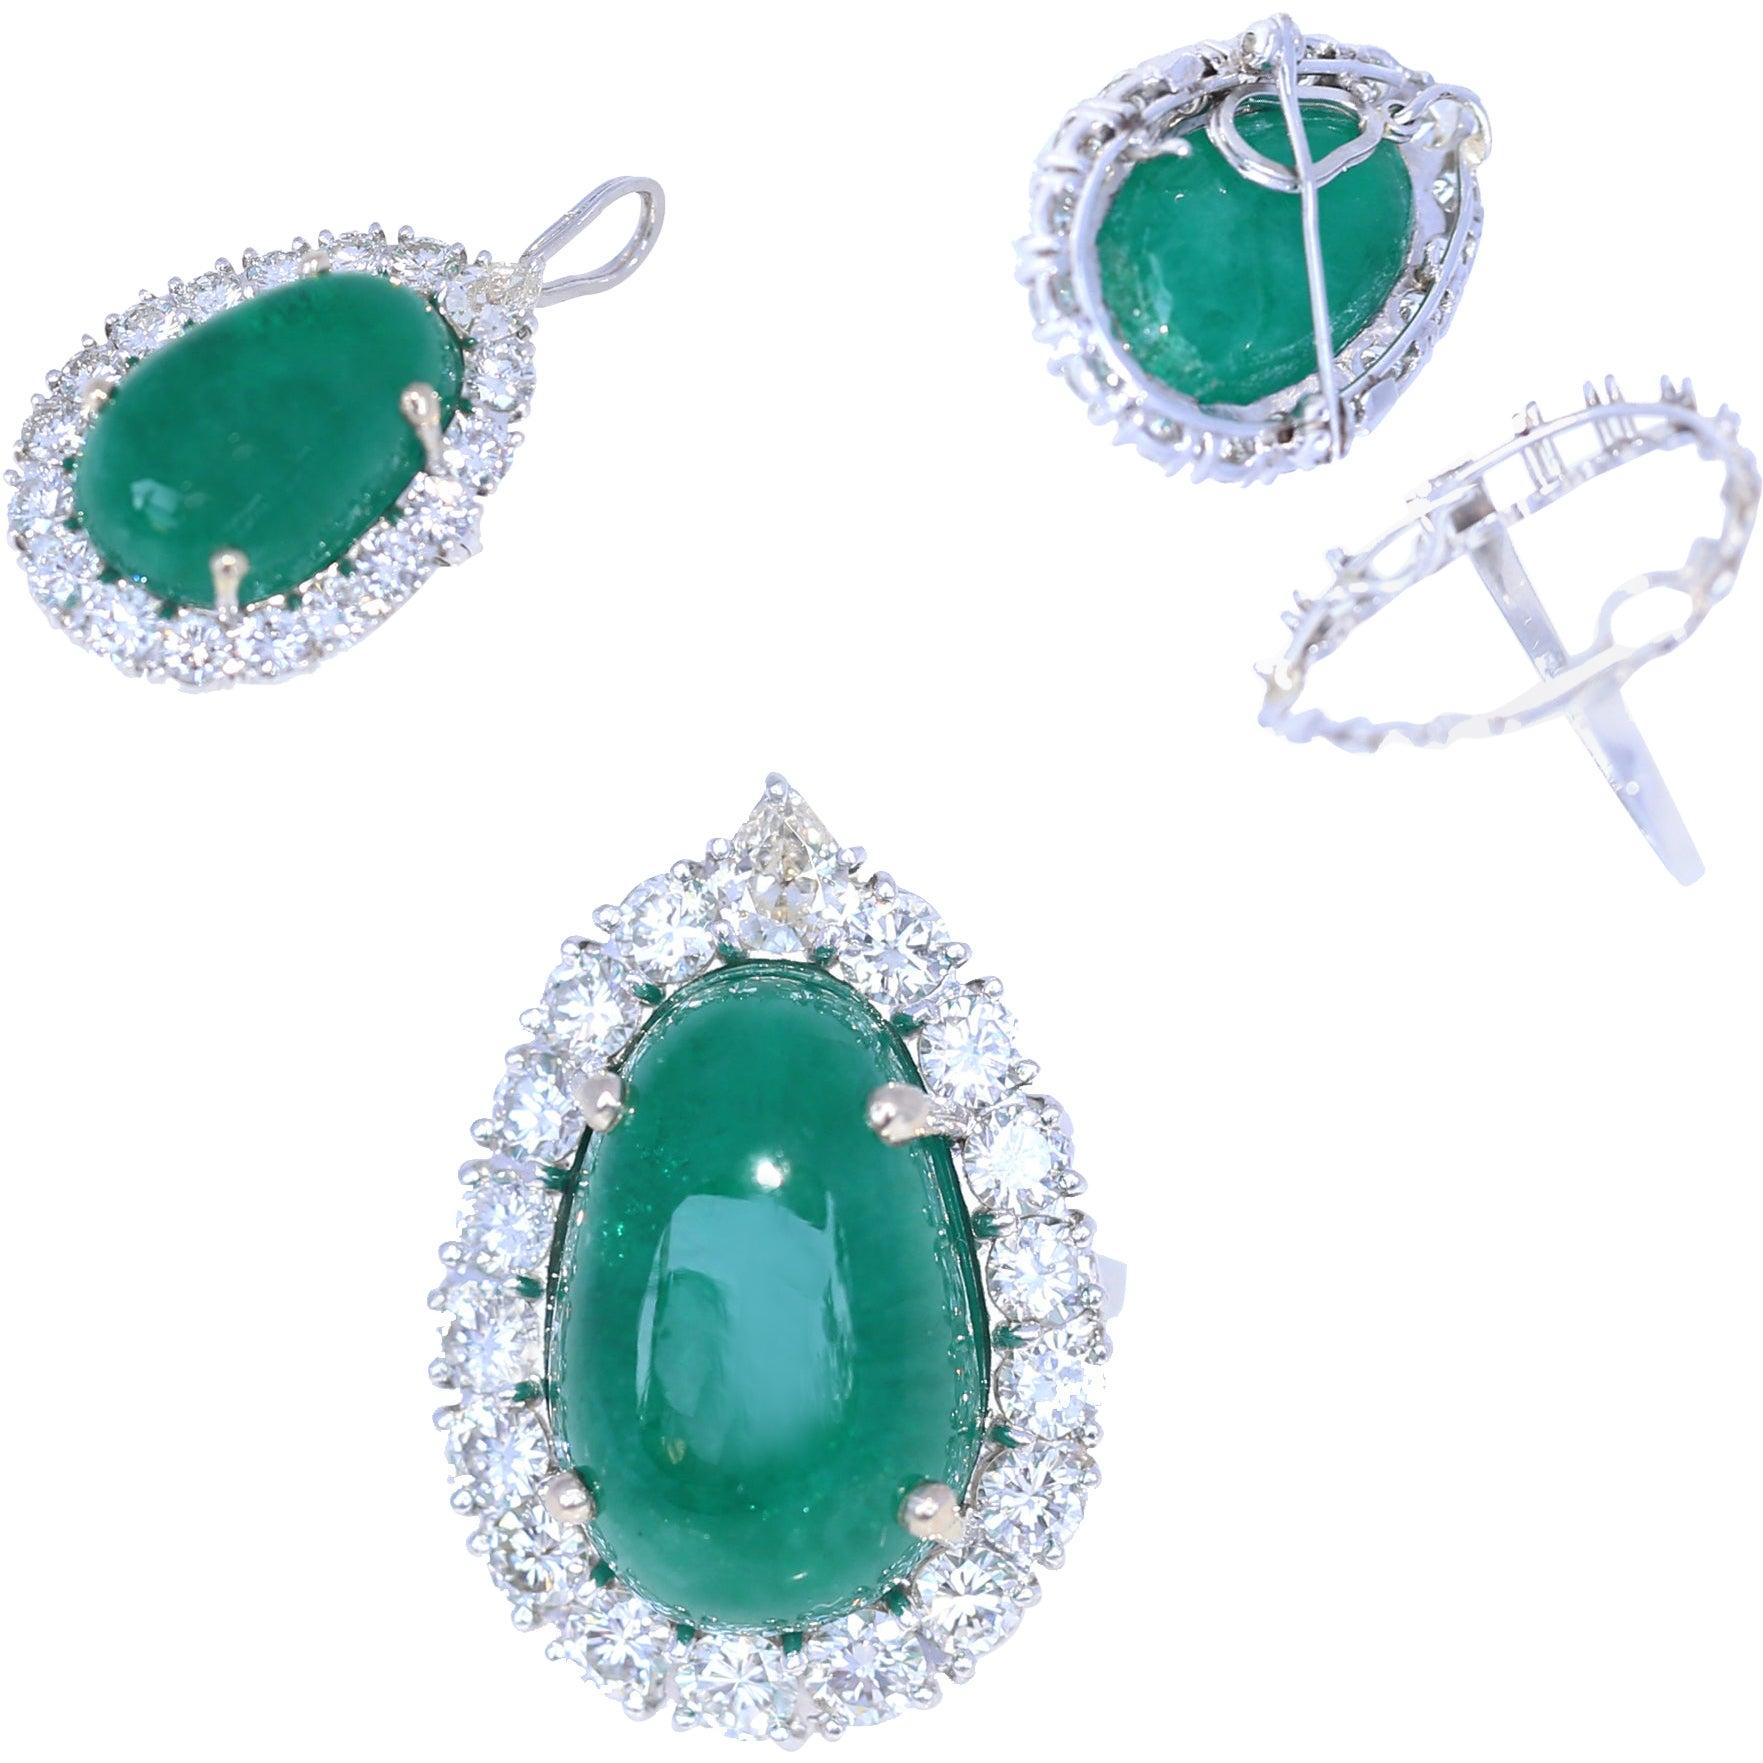 22 Carat Emerald 3 Carat Diamonds Ring Pendant Brooch Transformer Platinum, 1945